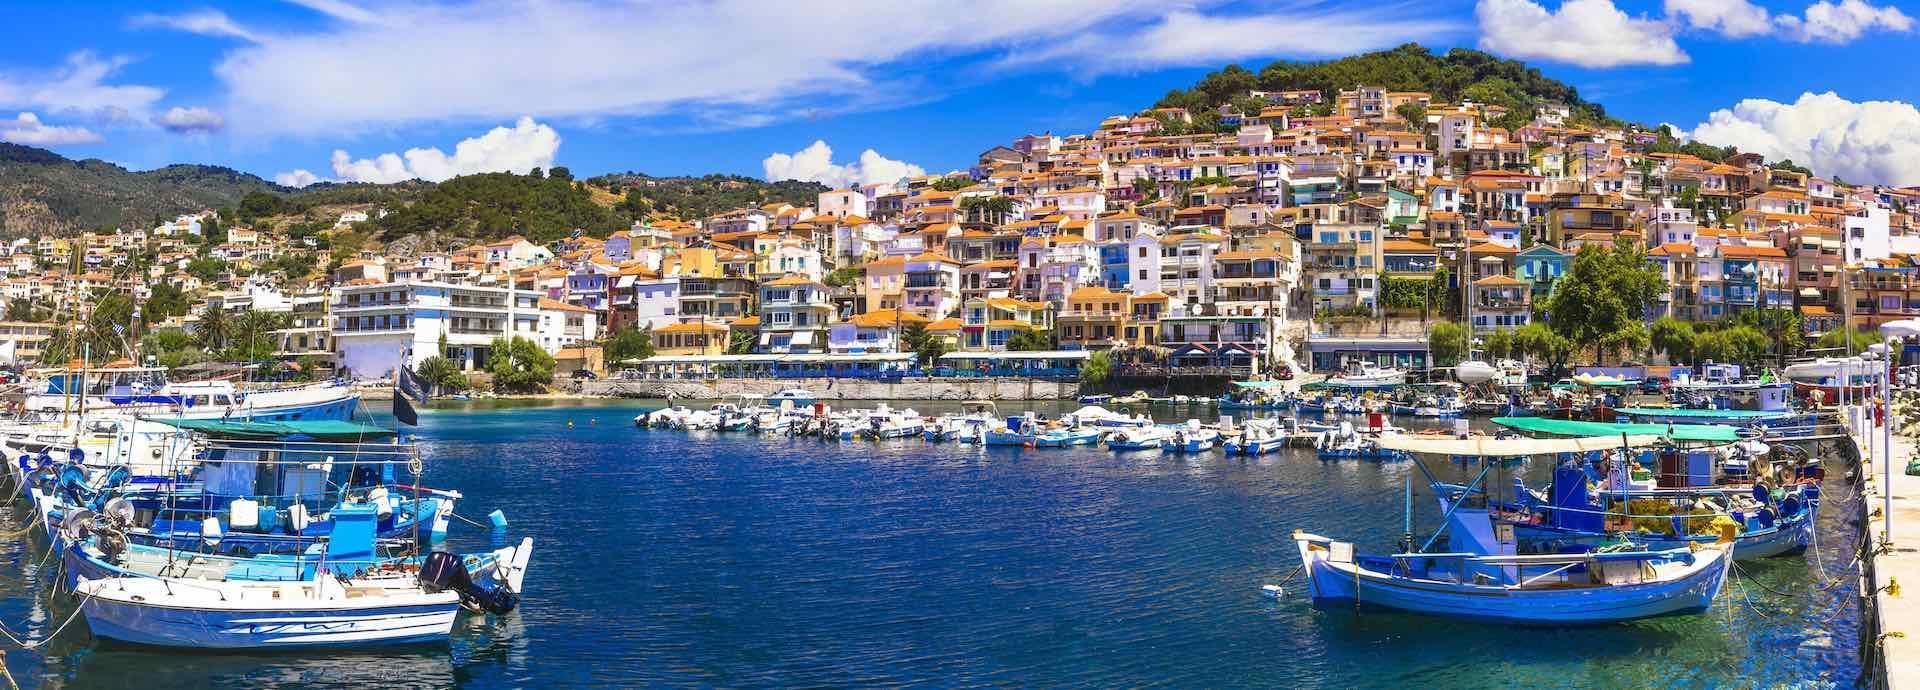 Increasing renewable energy penetration on a Mediterranean island